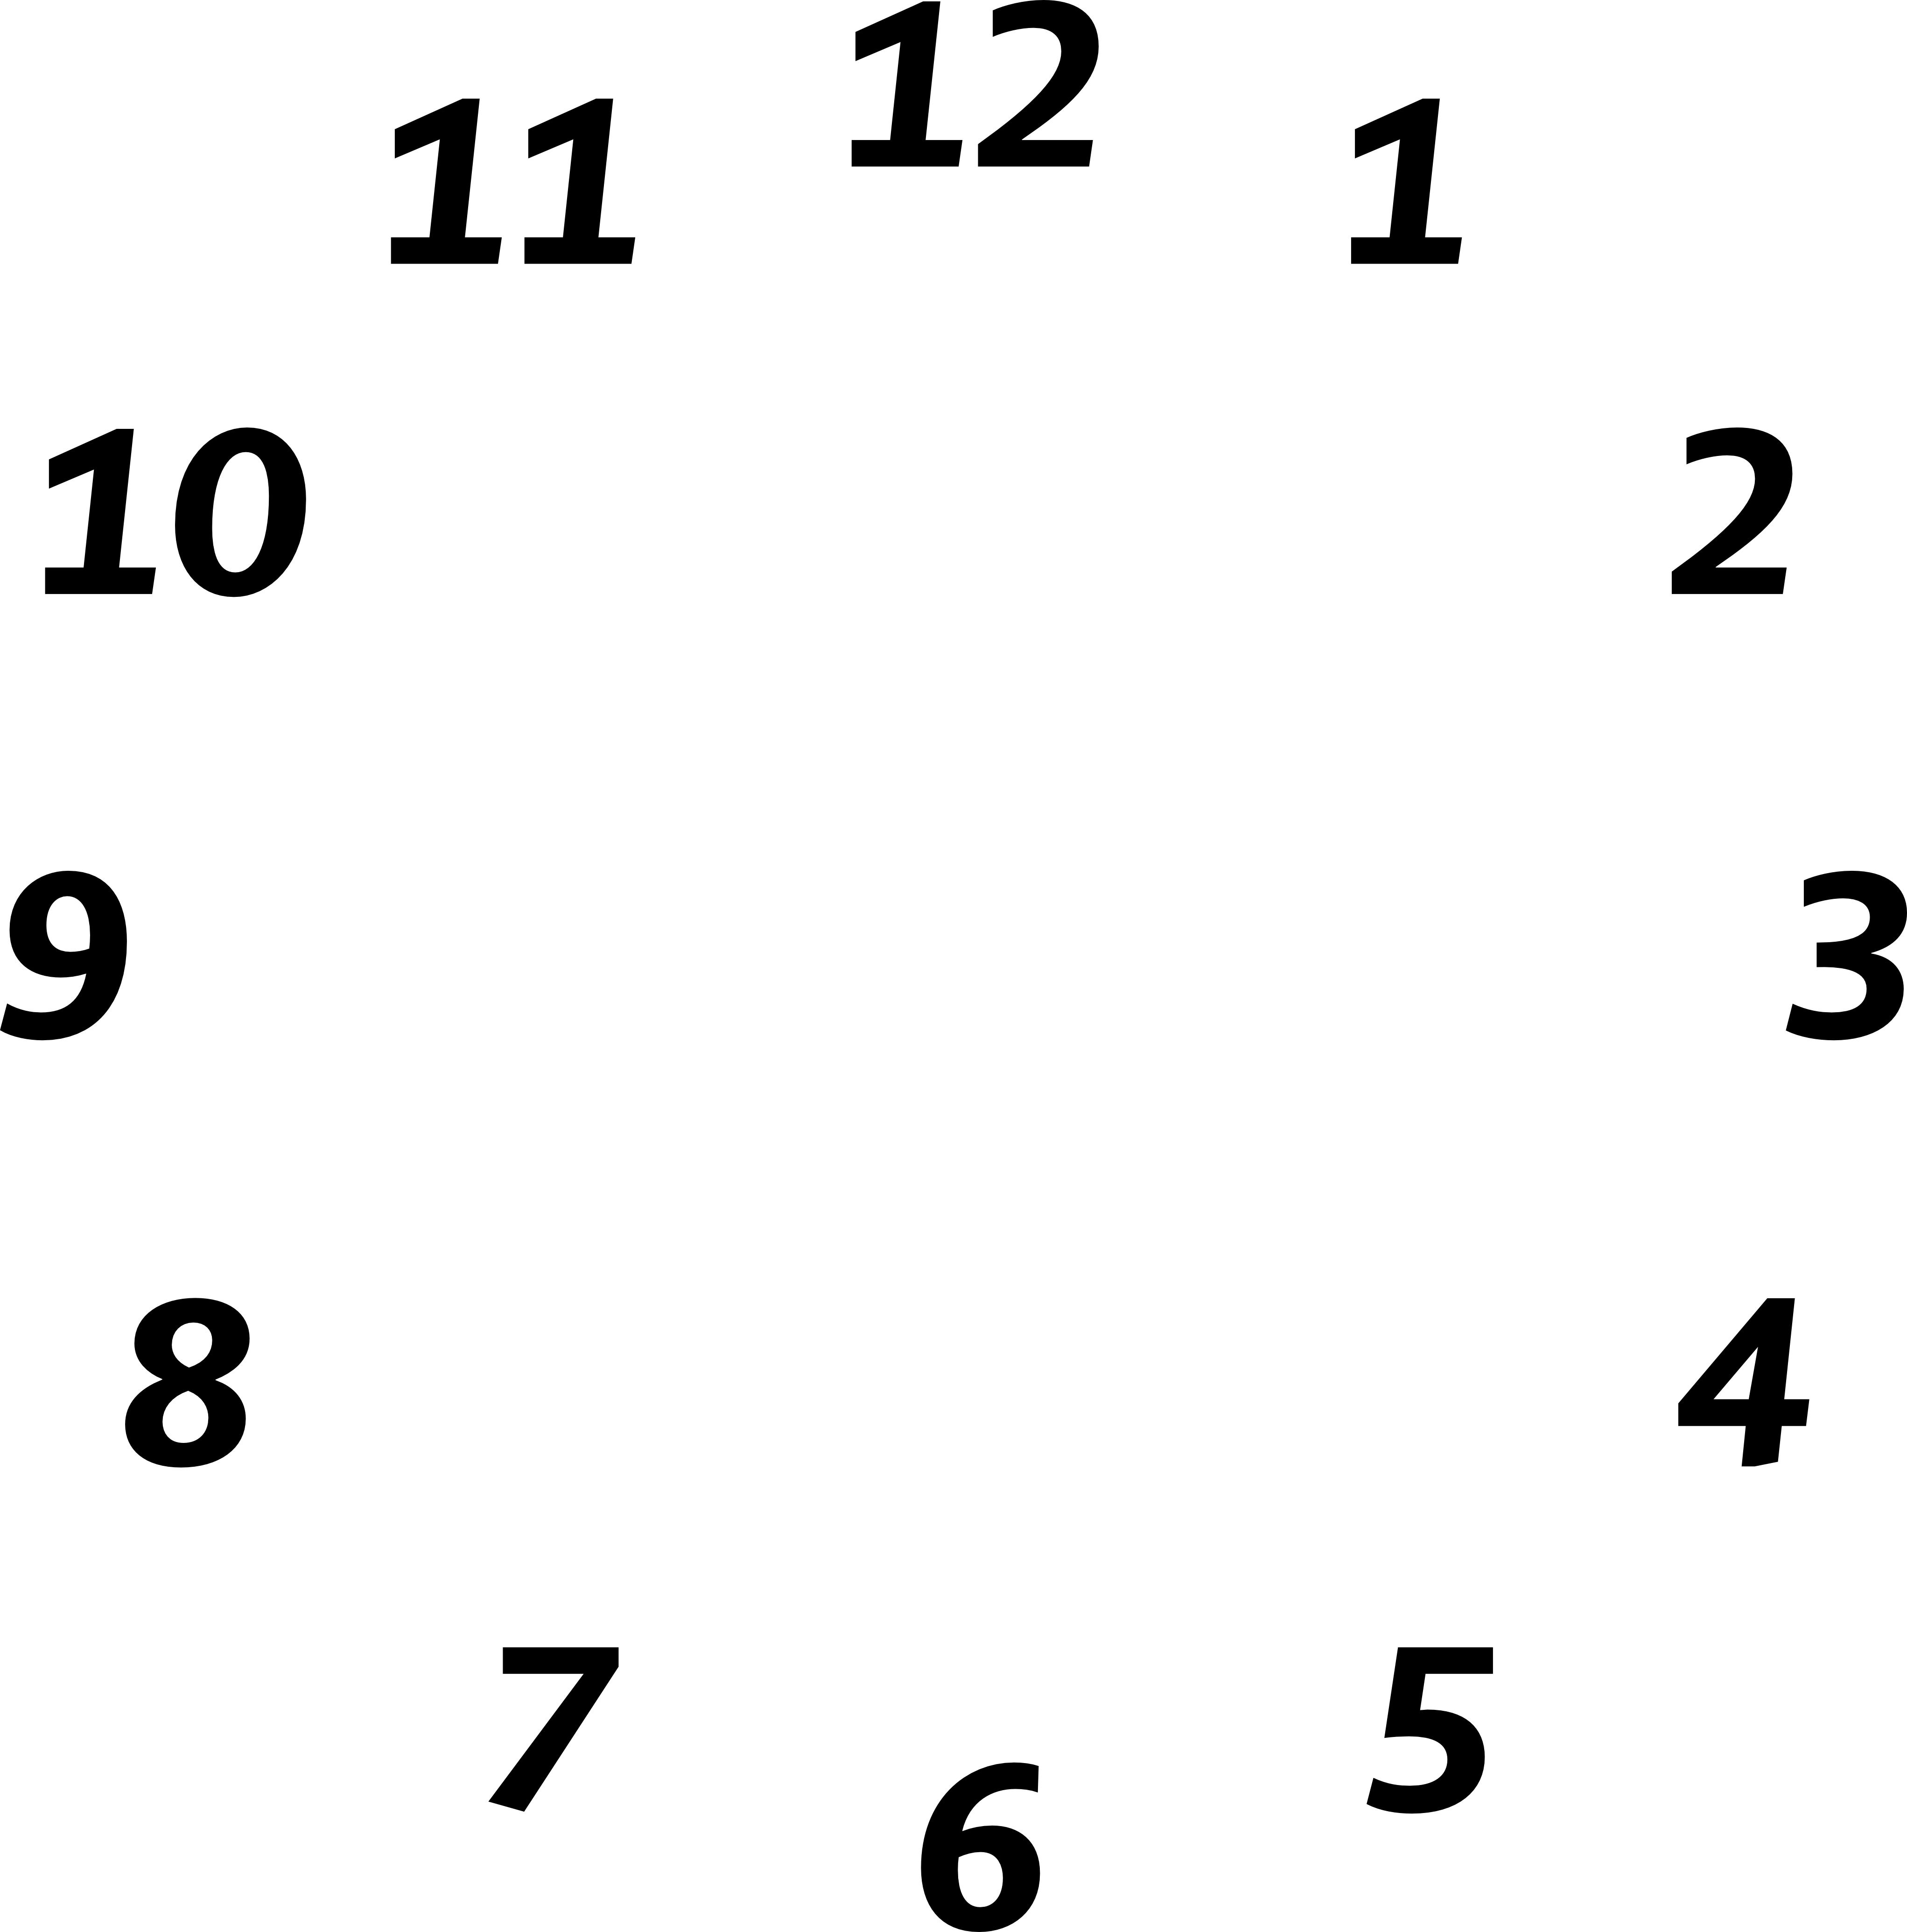 Image-eleven